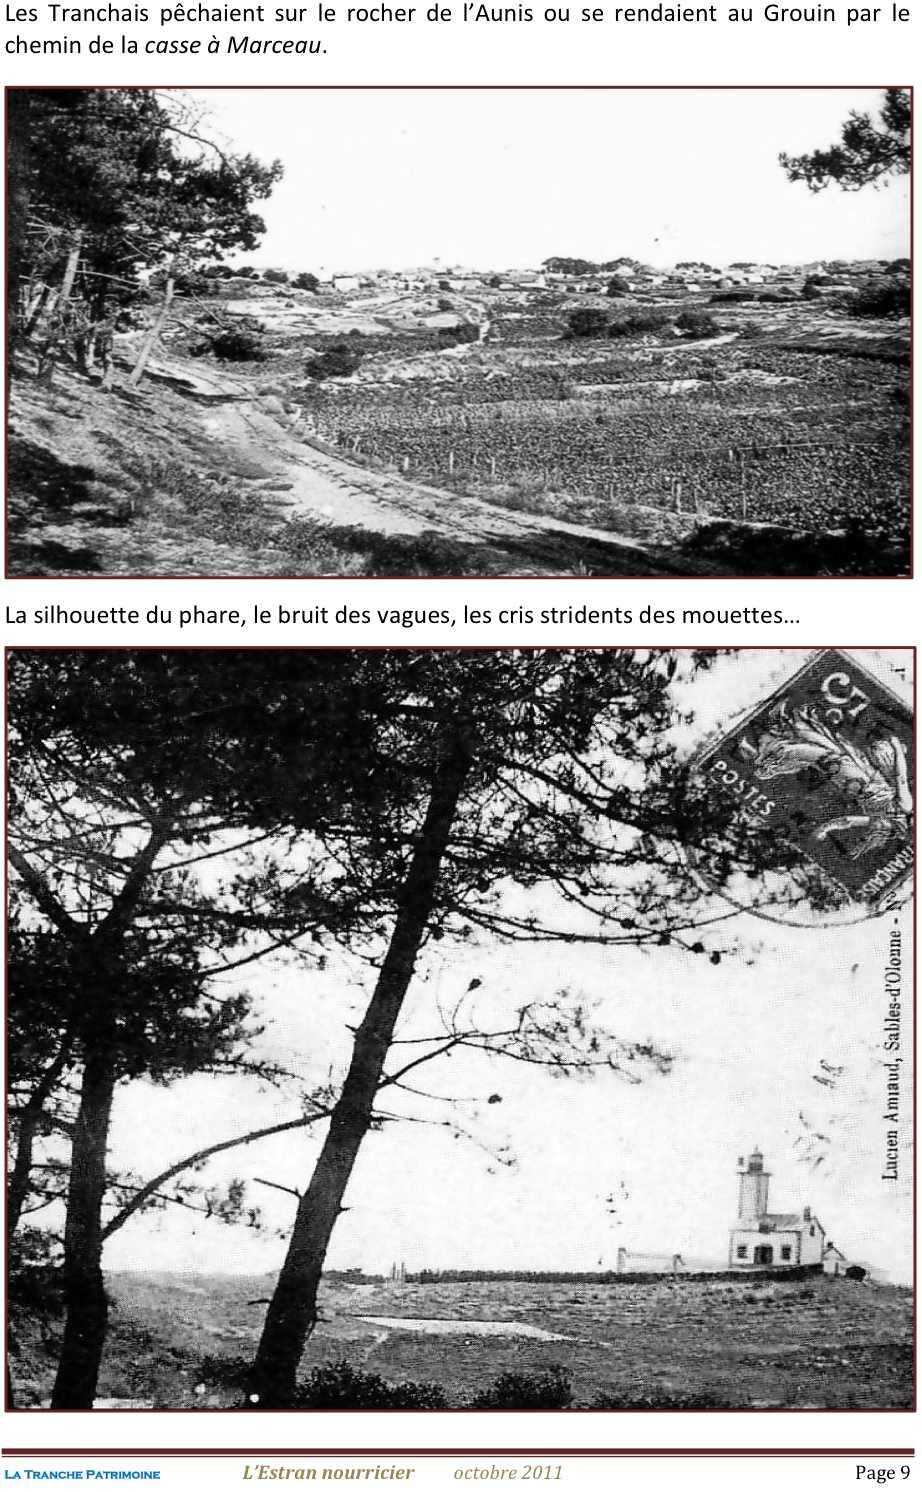 Lestran Nourricier 9 jpeg.jpg